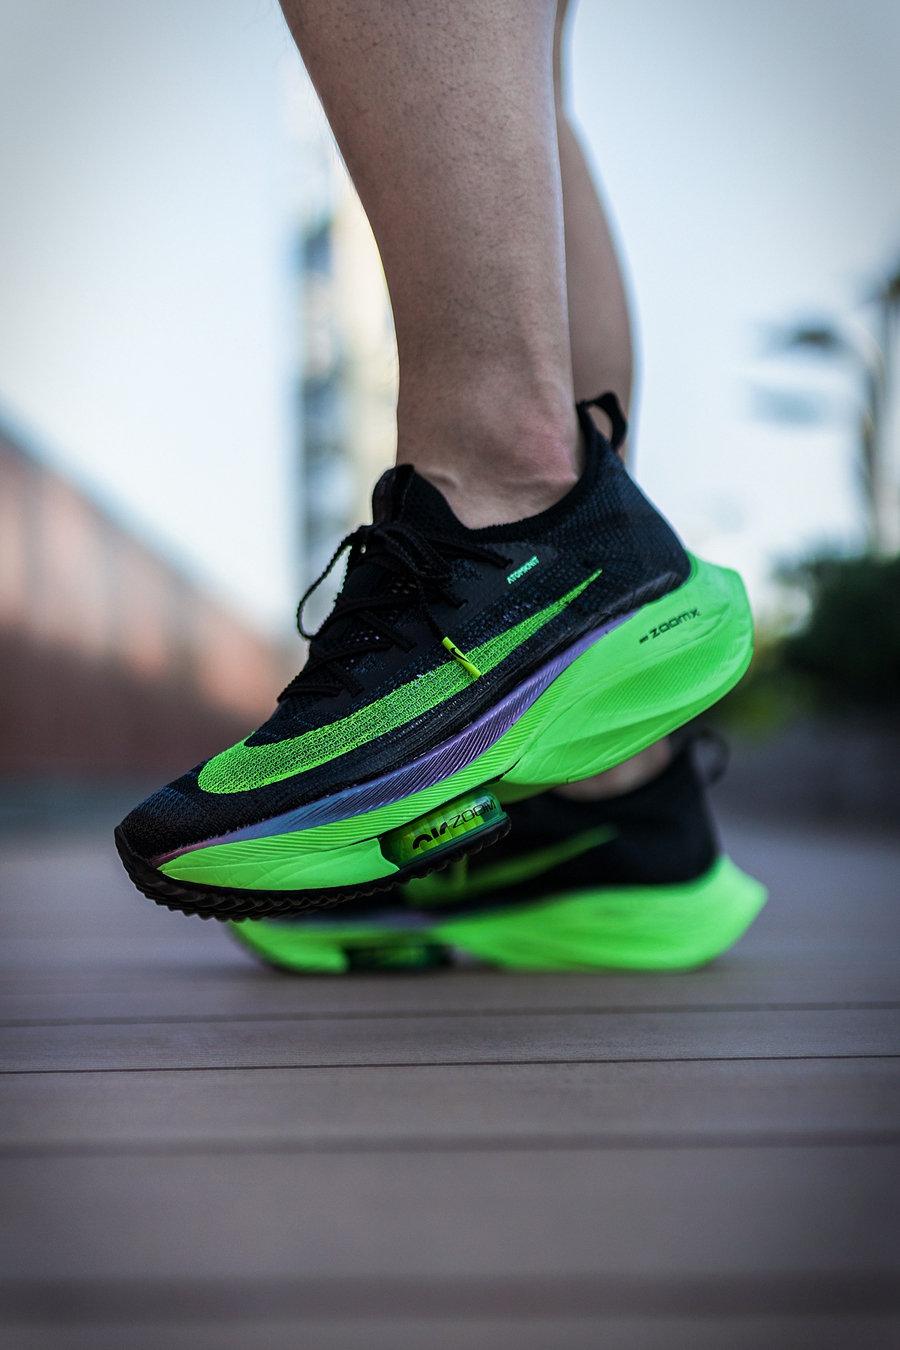 Nike,Alphafly Next%,Alphafly  開箱跑鞋中的蘭博基尼!穿這雙 Nike「韓寒同款」走路,比打車還貴